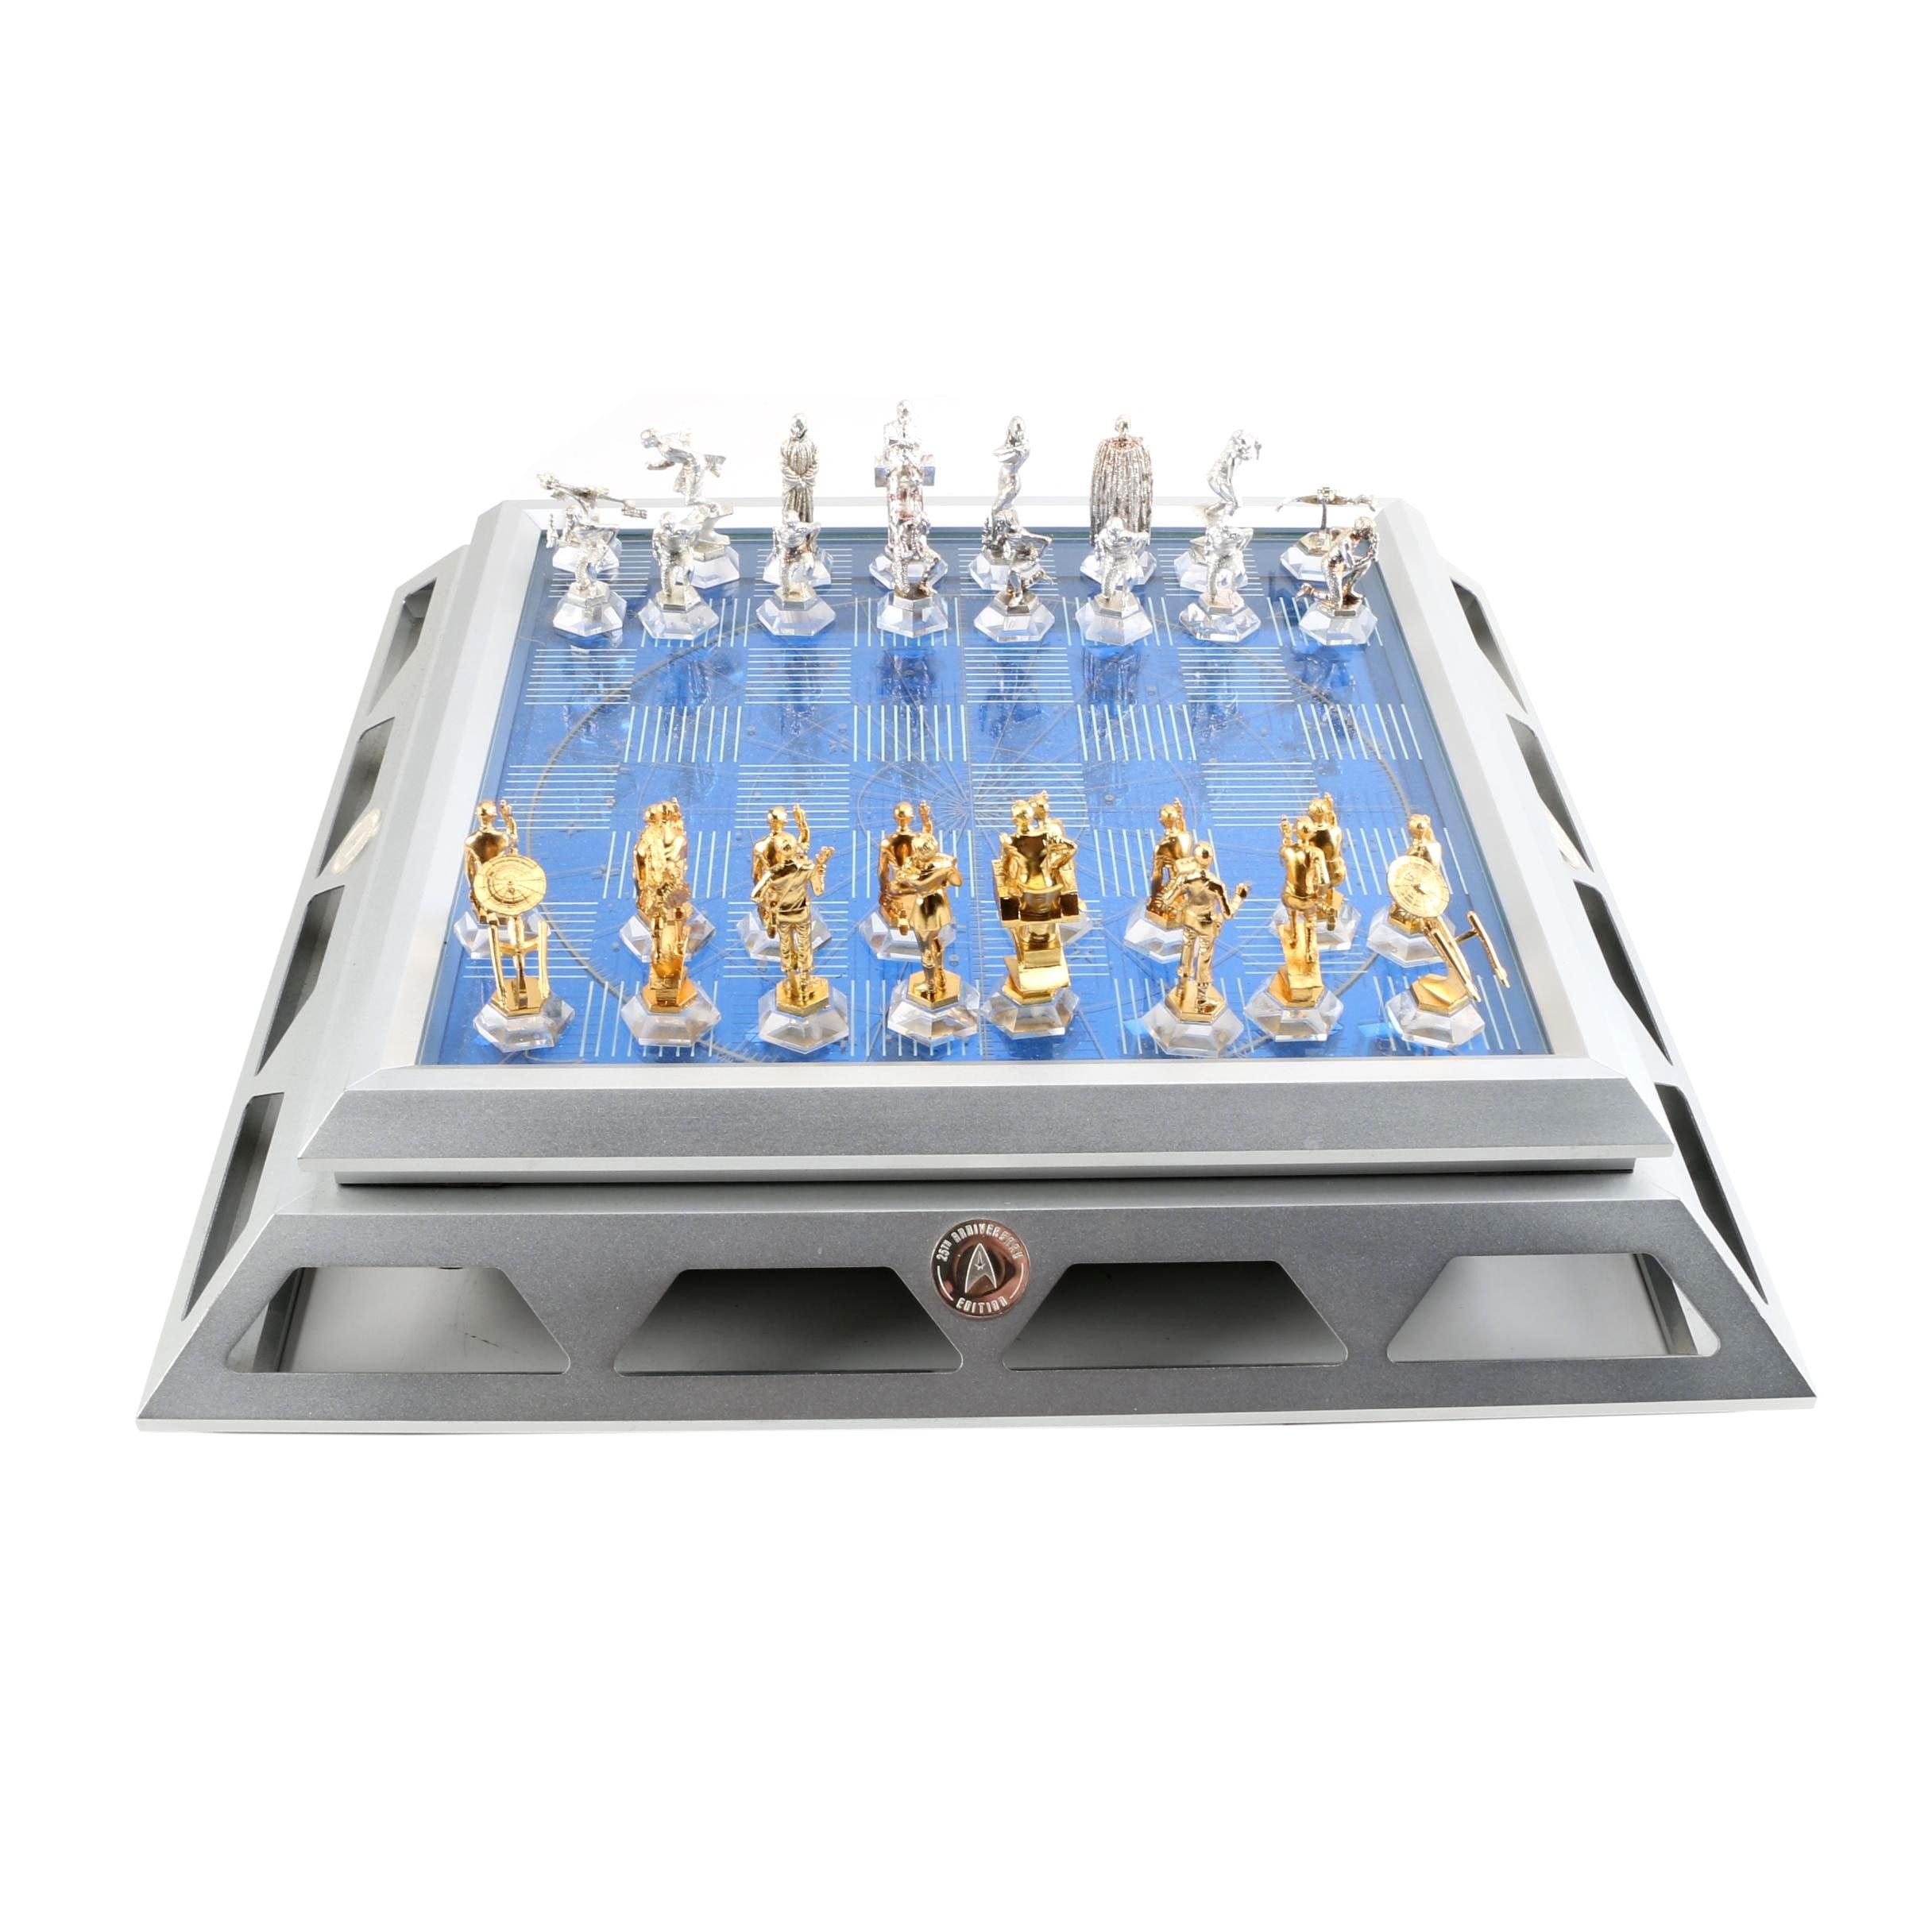 25th Anniversary Edition Star Trek Chess Set